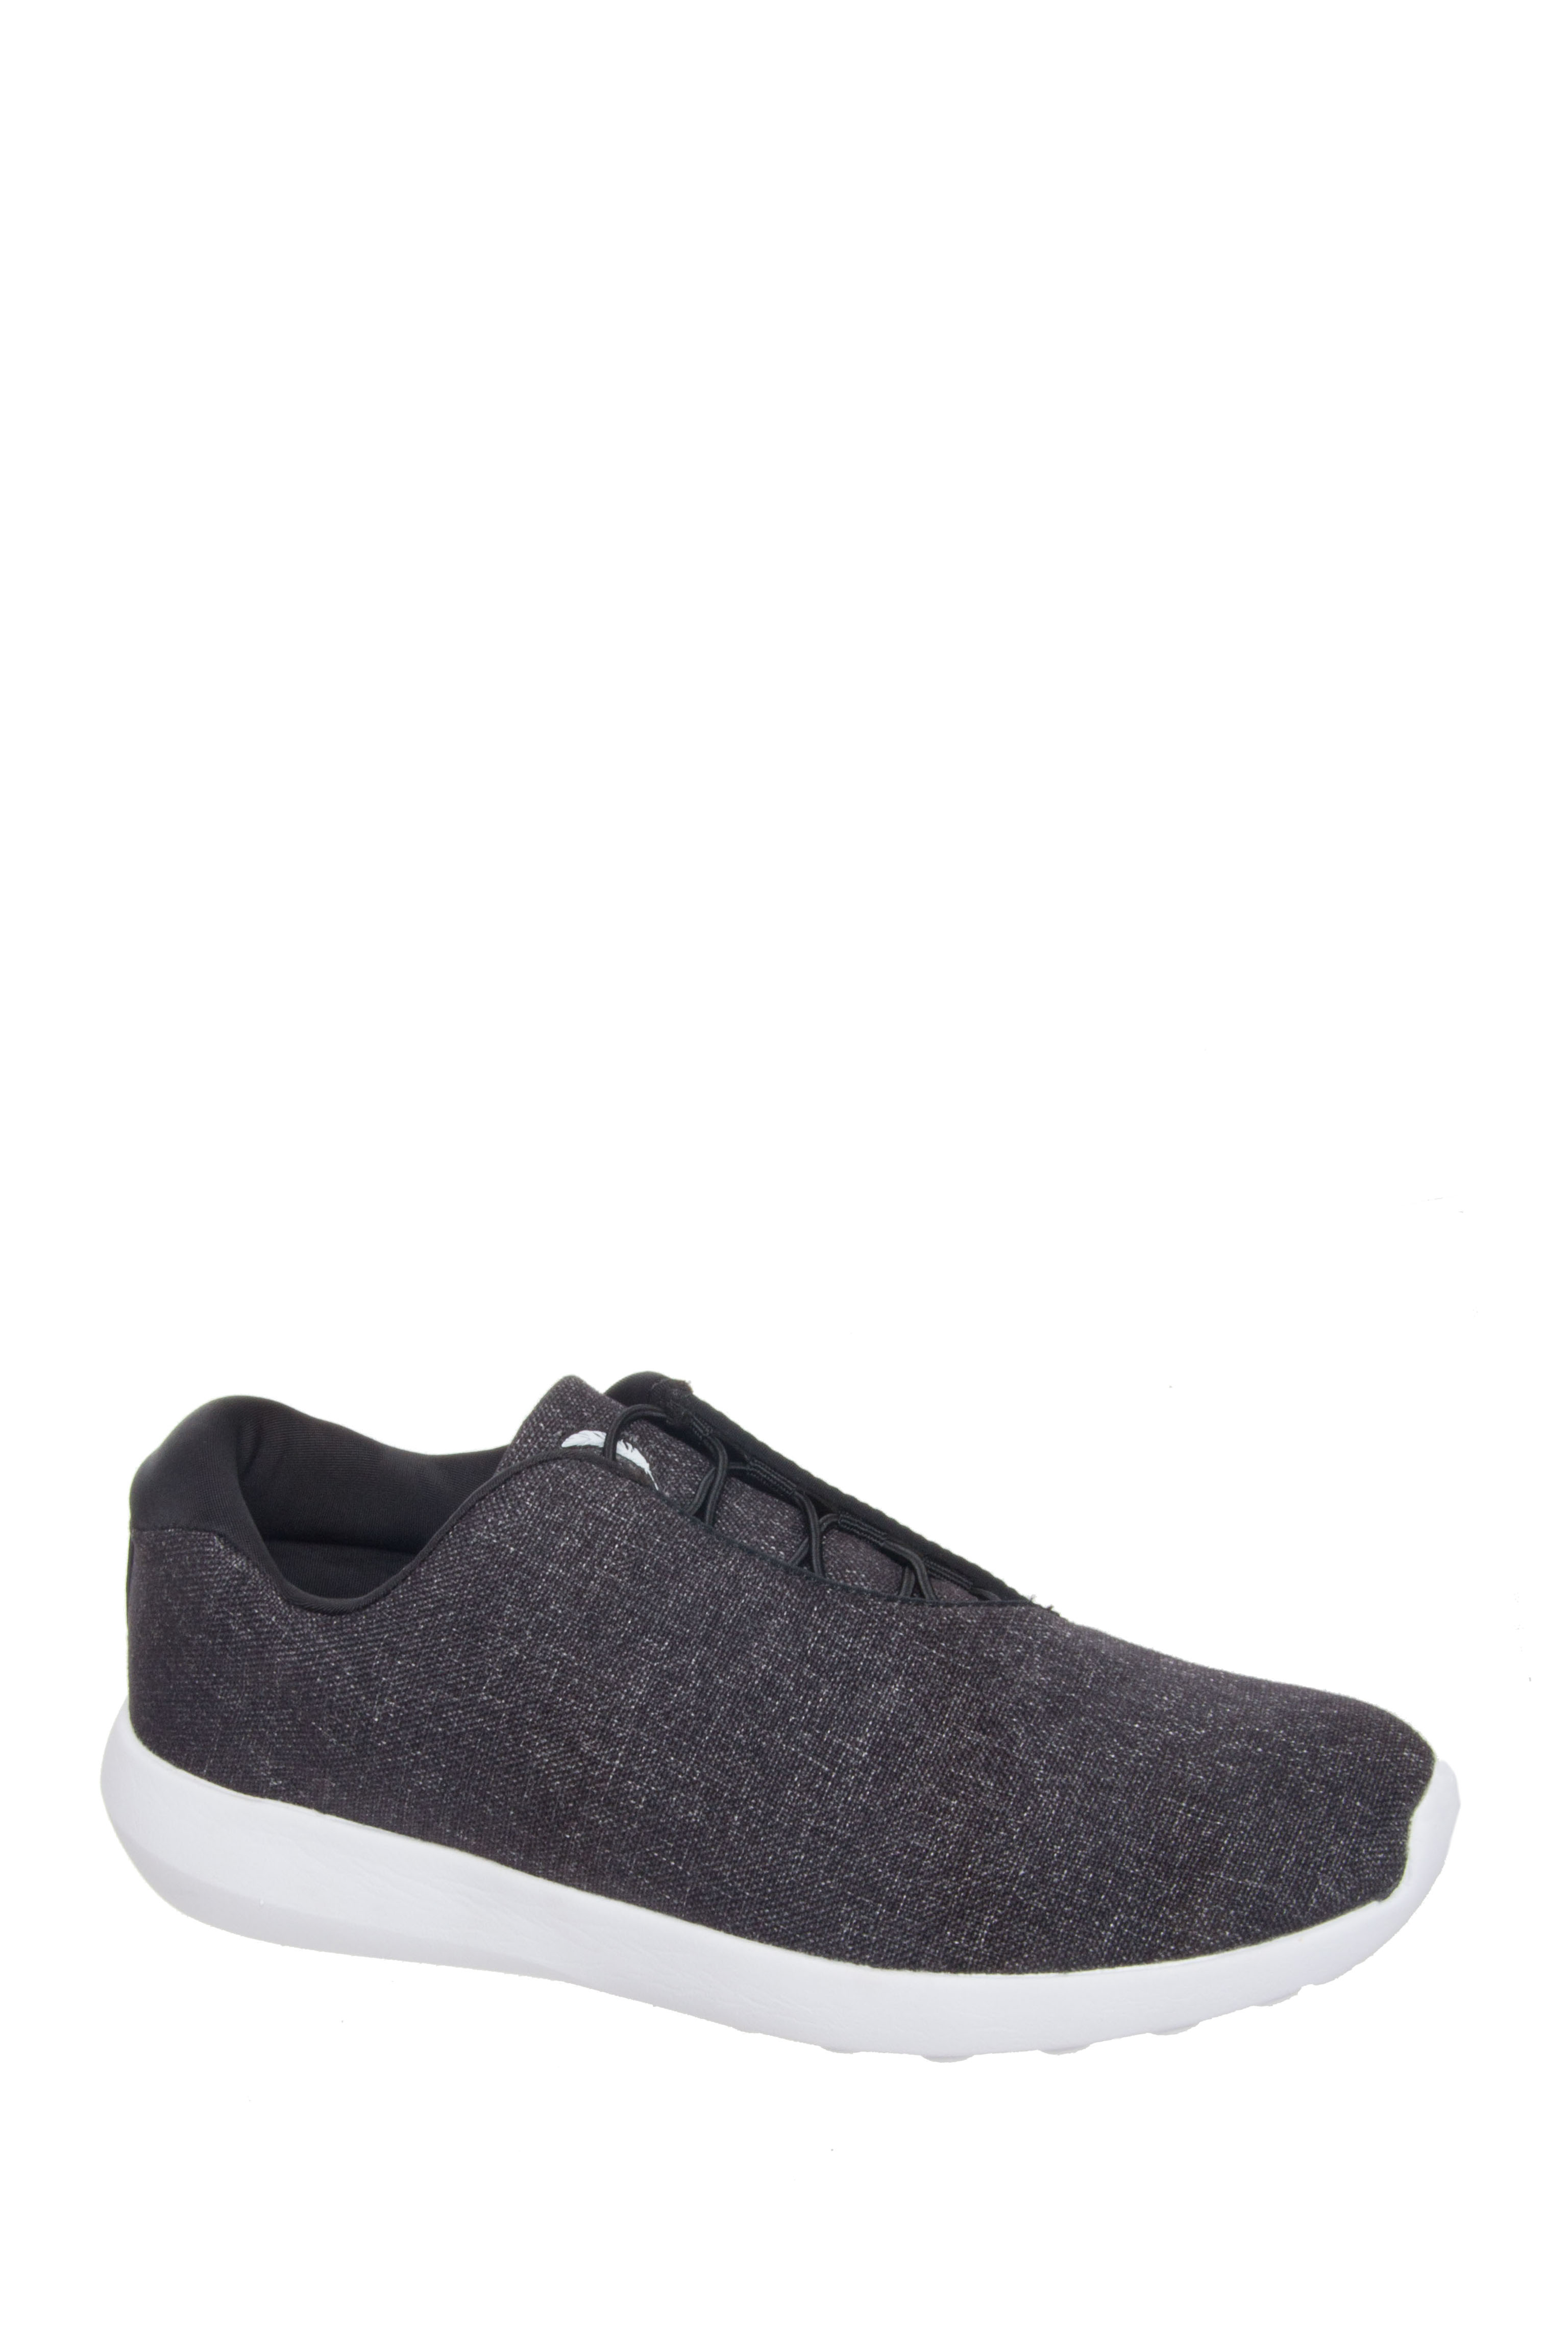 Jessica Simpson Nessa Low Top Sneakers - Black Heather